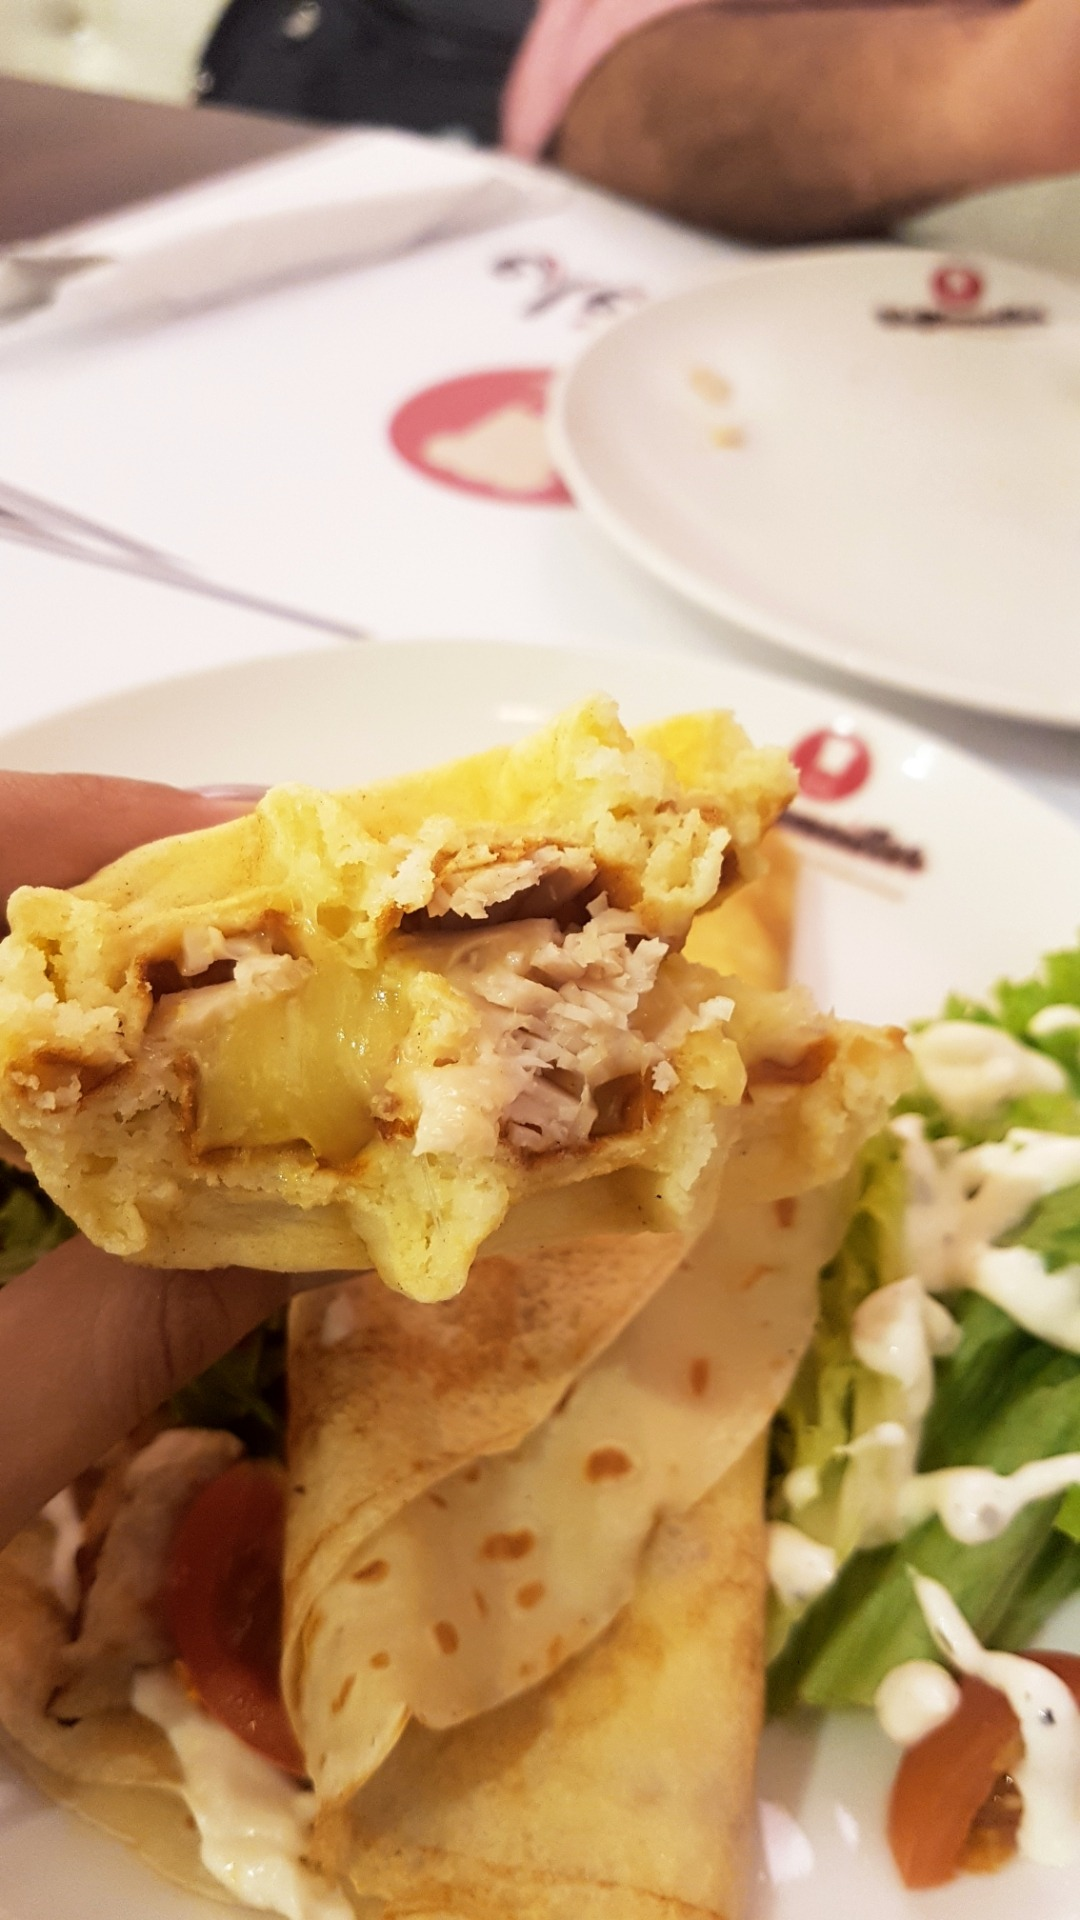 Turkey cheese waffle @ Wafflemeister - Bahrain